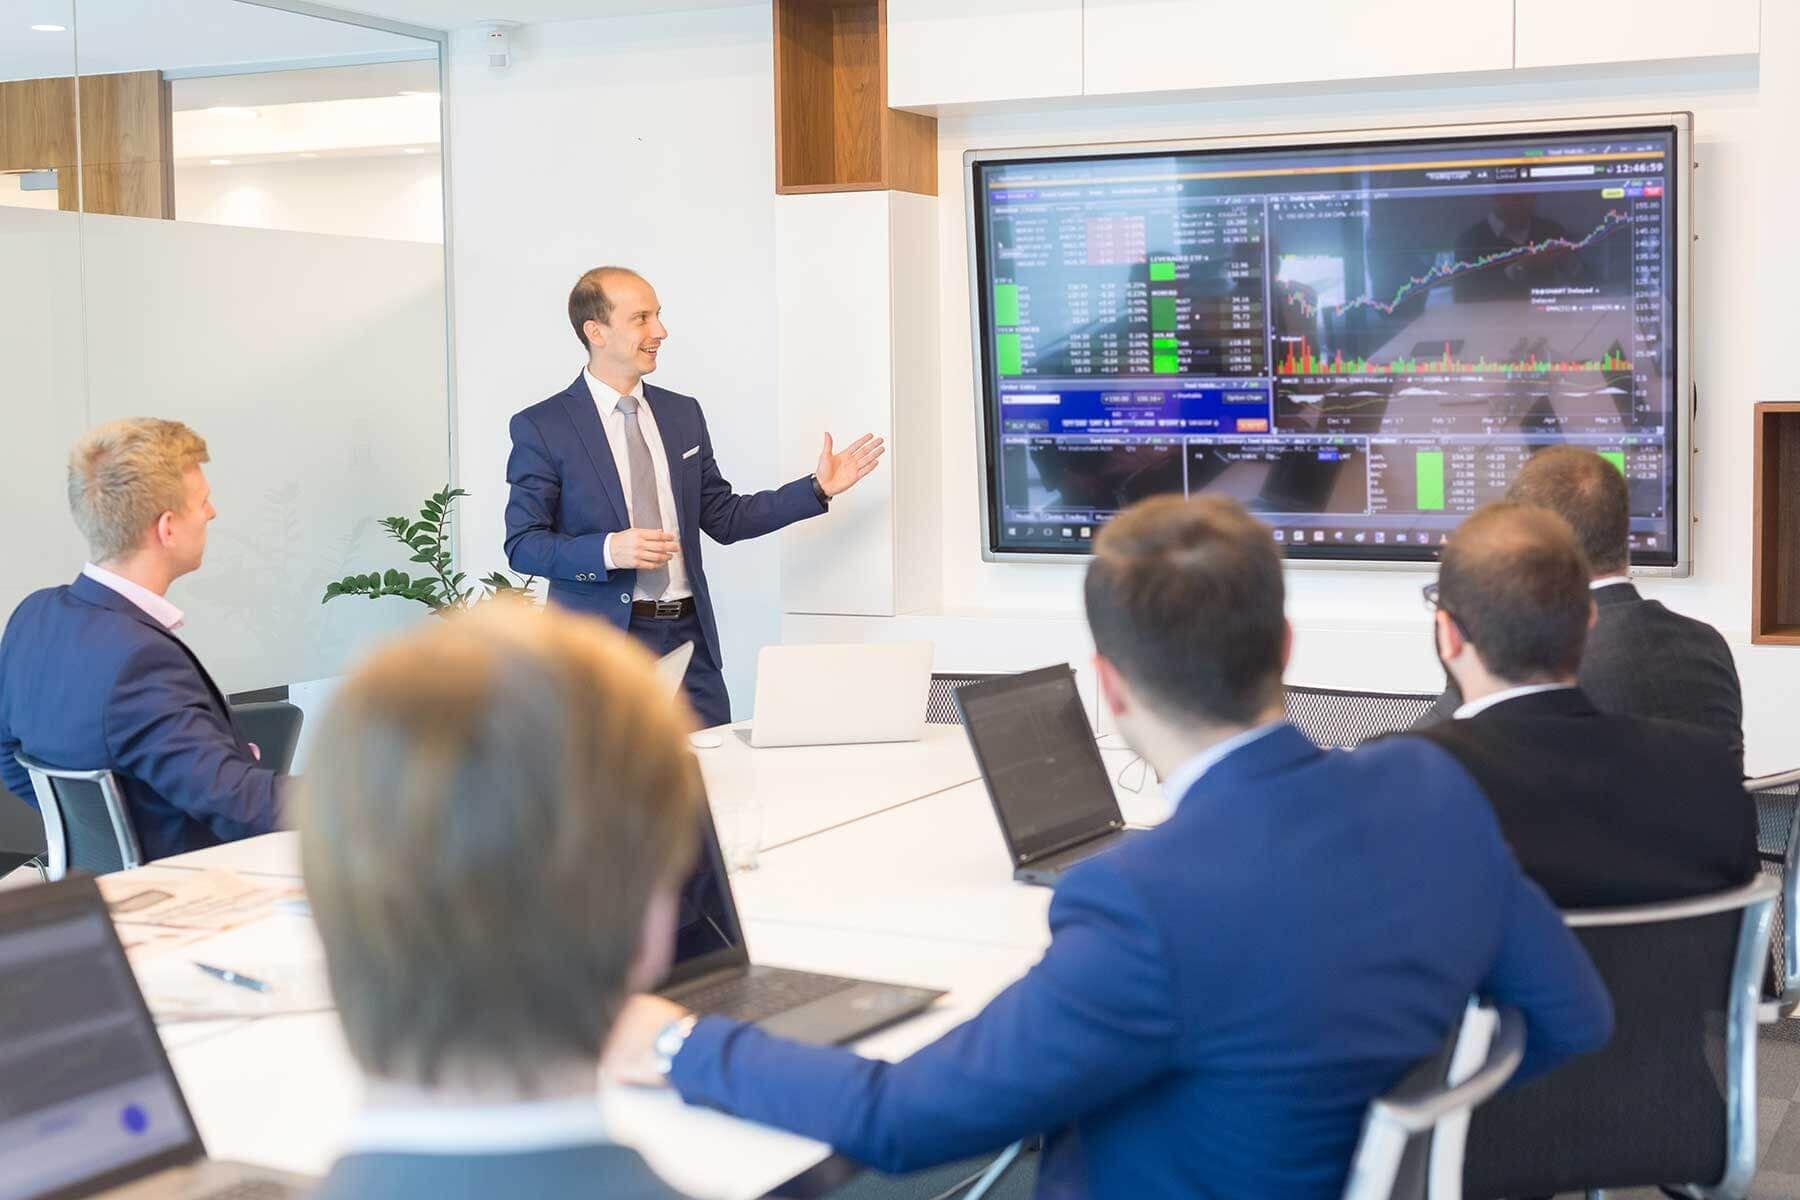 10 Best Forex Trading Seminars in